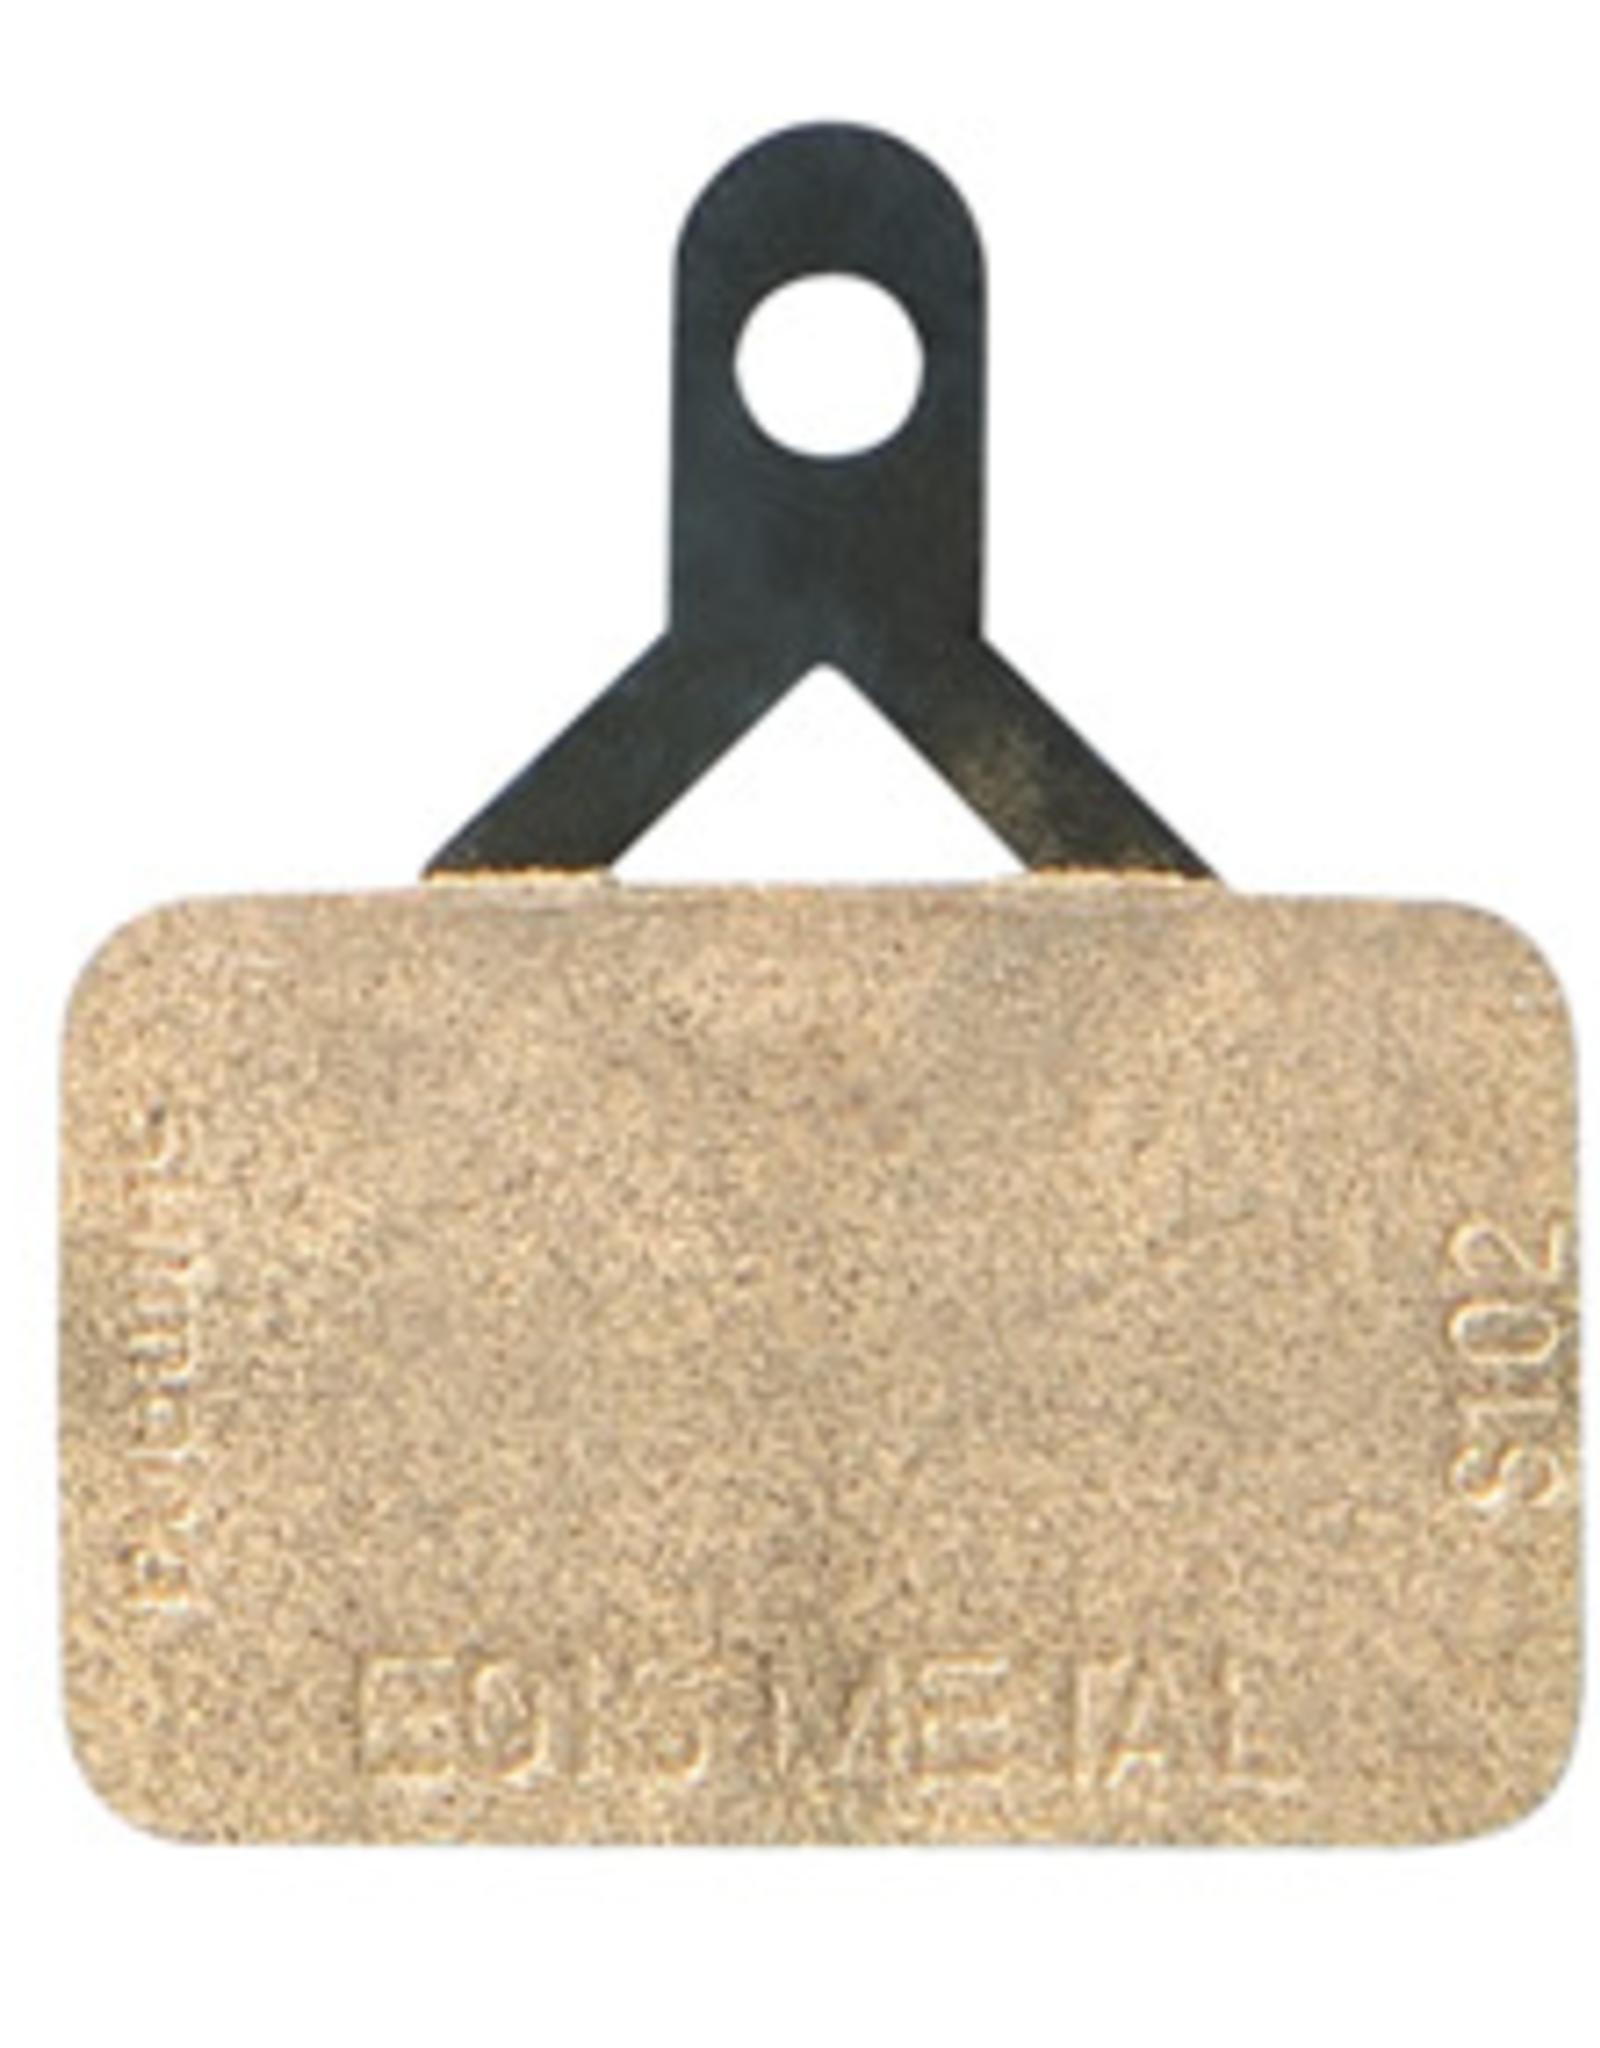 Shimano E01s Disc brake pads